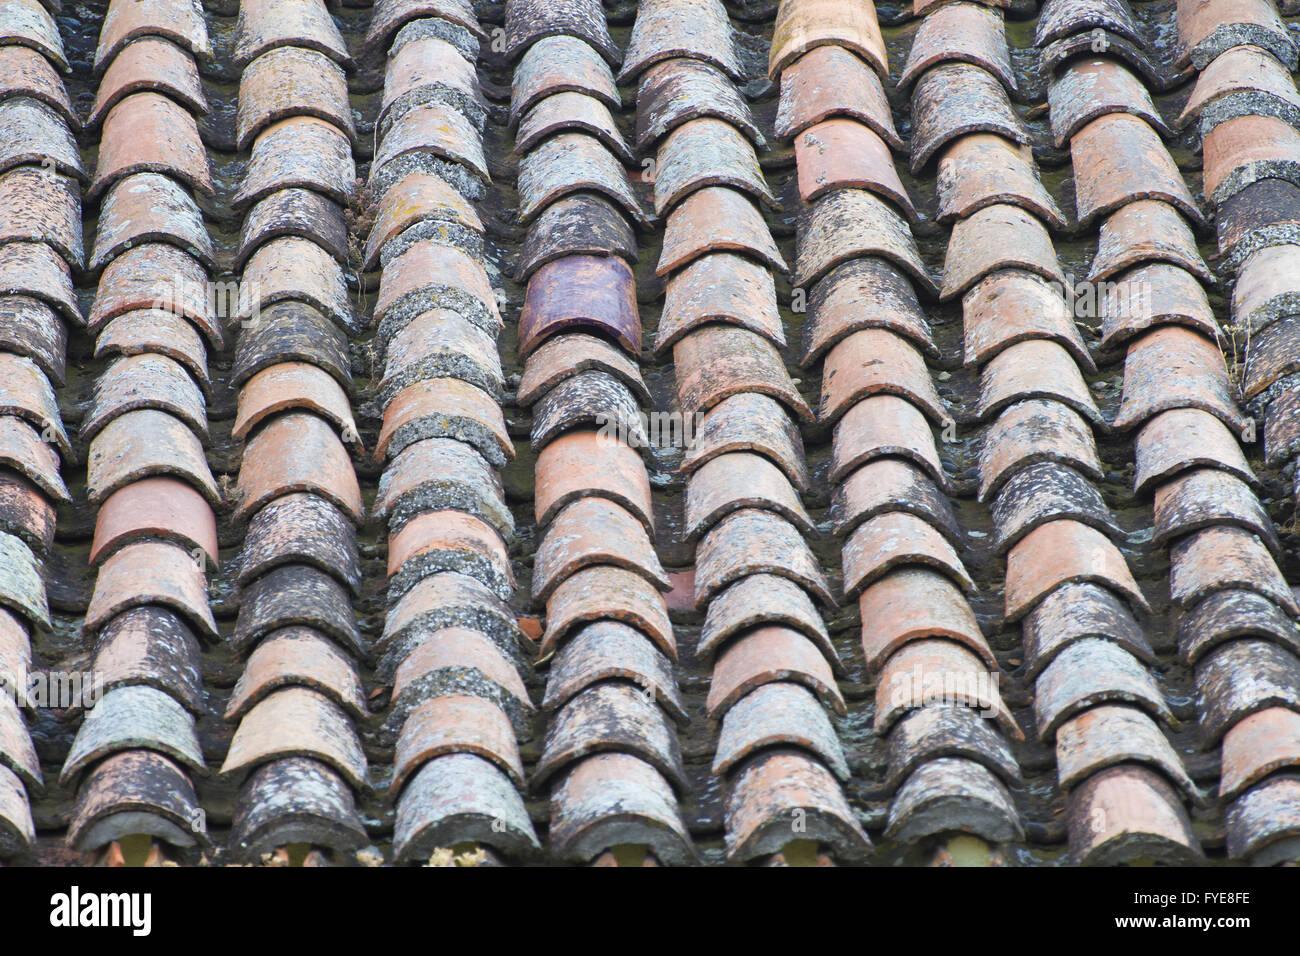 Antique roof tiles, spain architecture - Stock Image